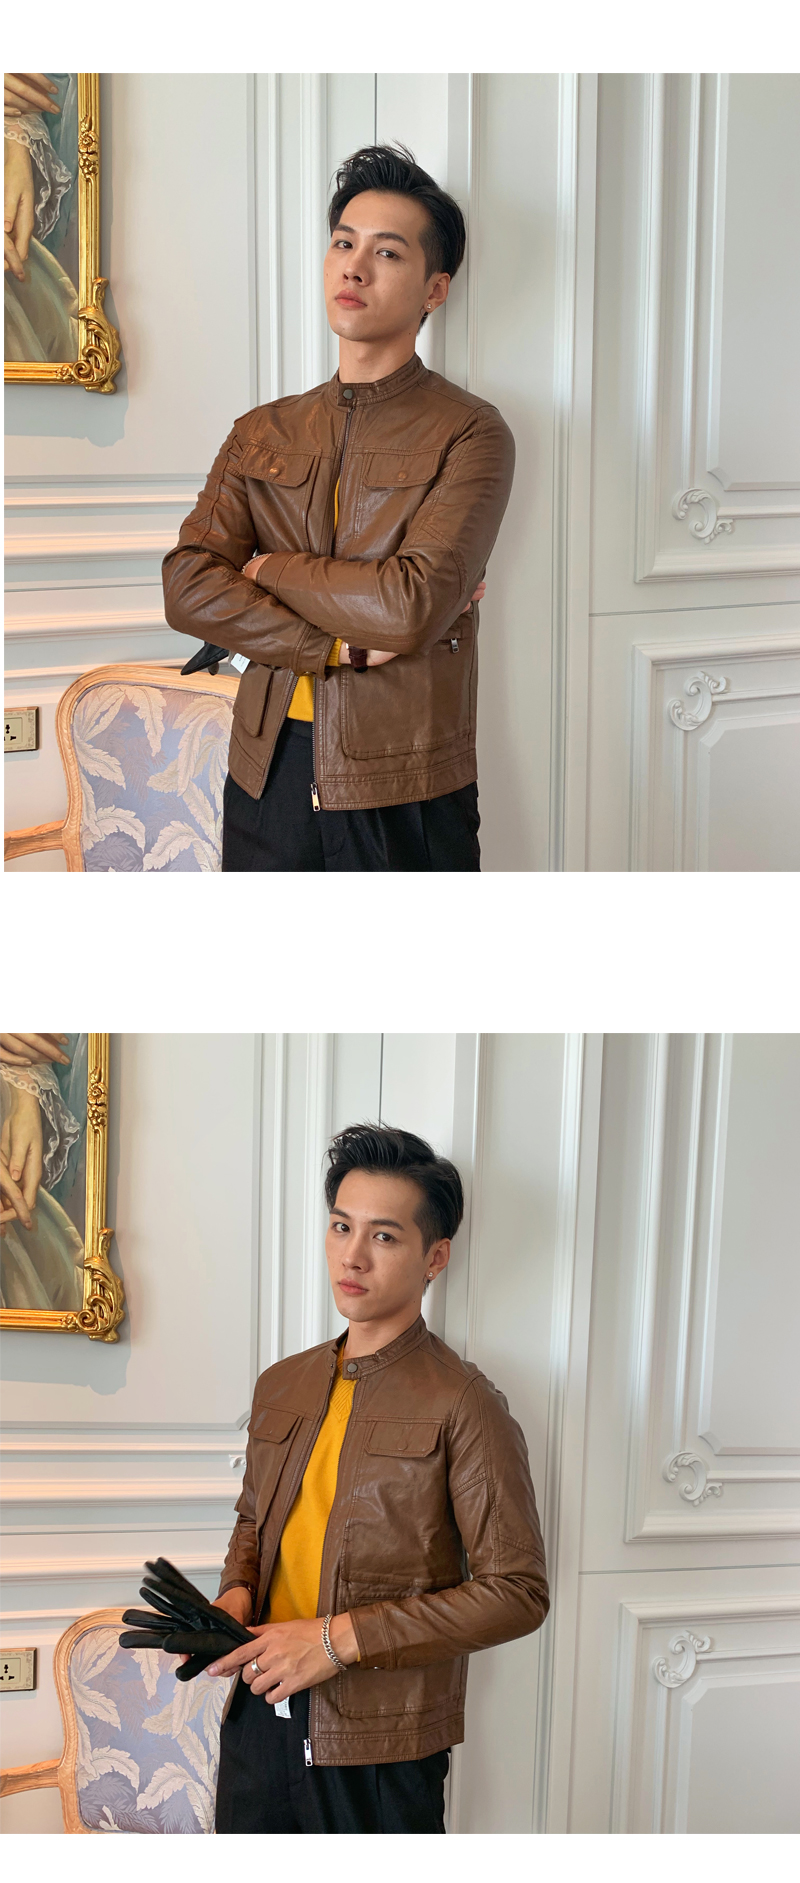 South Korea Korean version handsome collar leather jacket men's retro personality PU leather clothing fashion 100 locomotive leather fashion tide 59 Online shopping Bangladesh